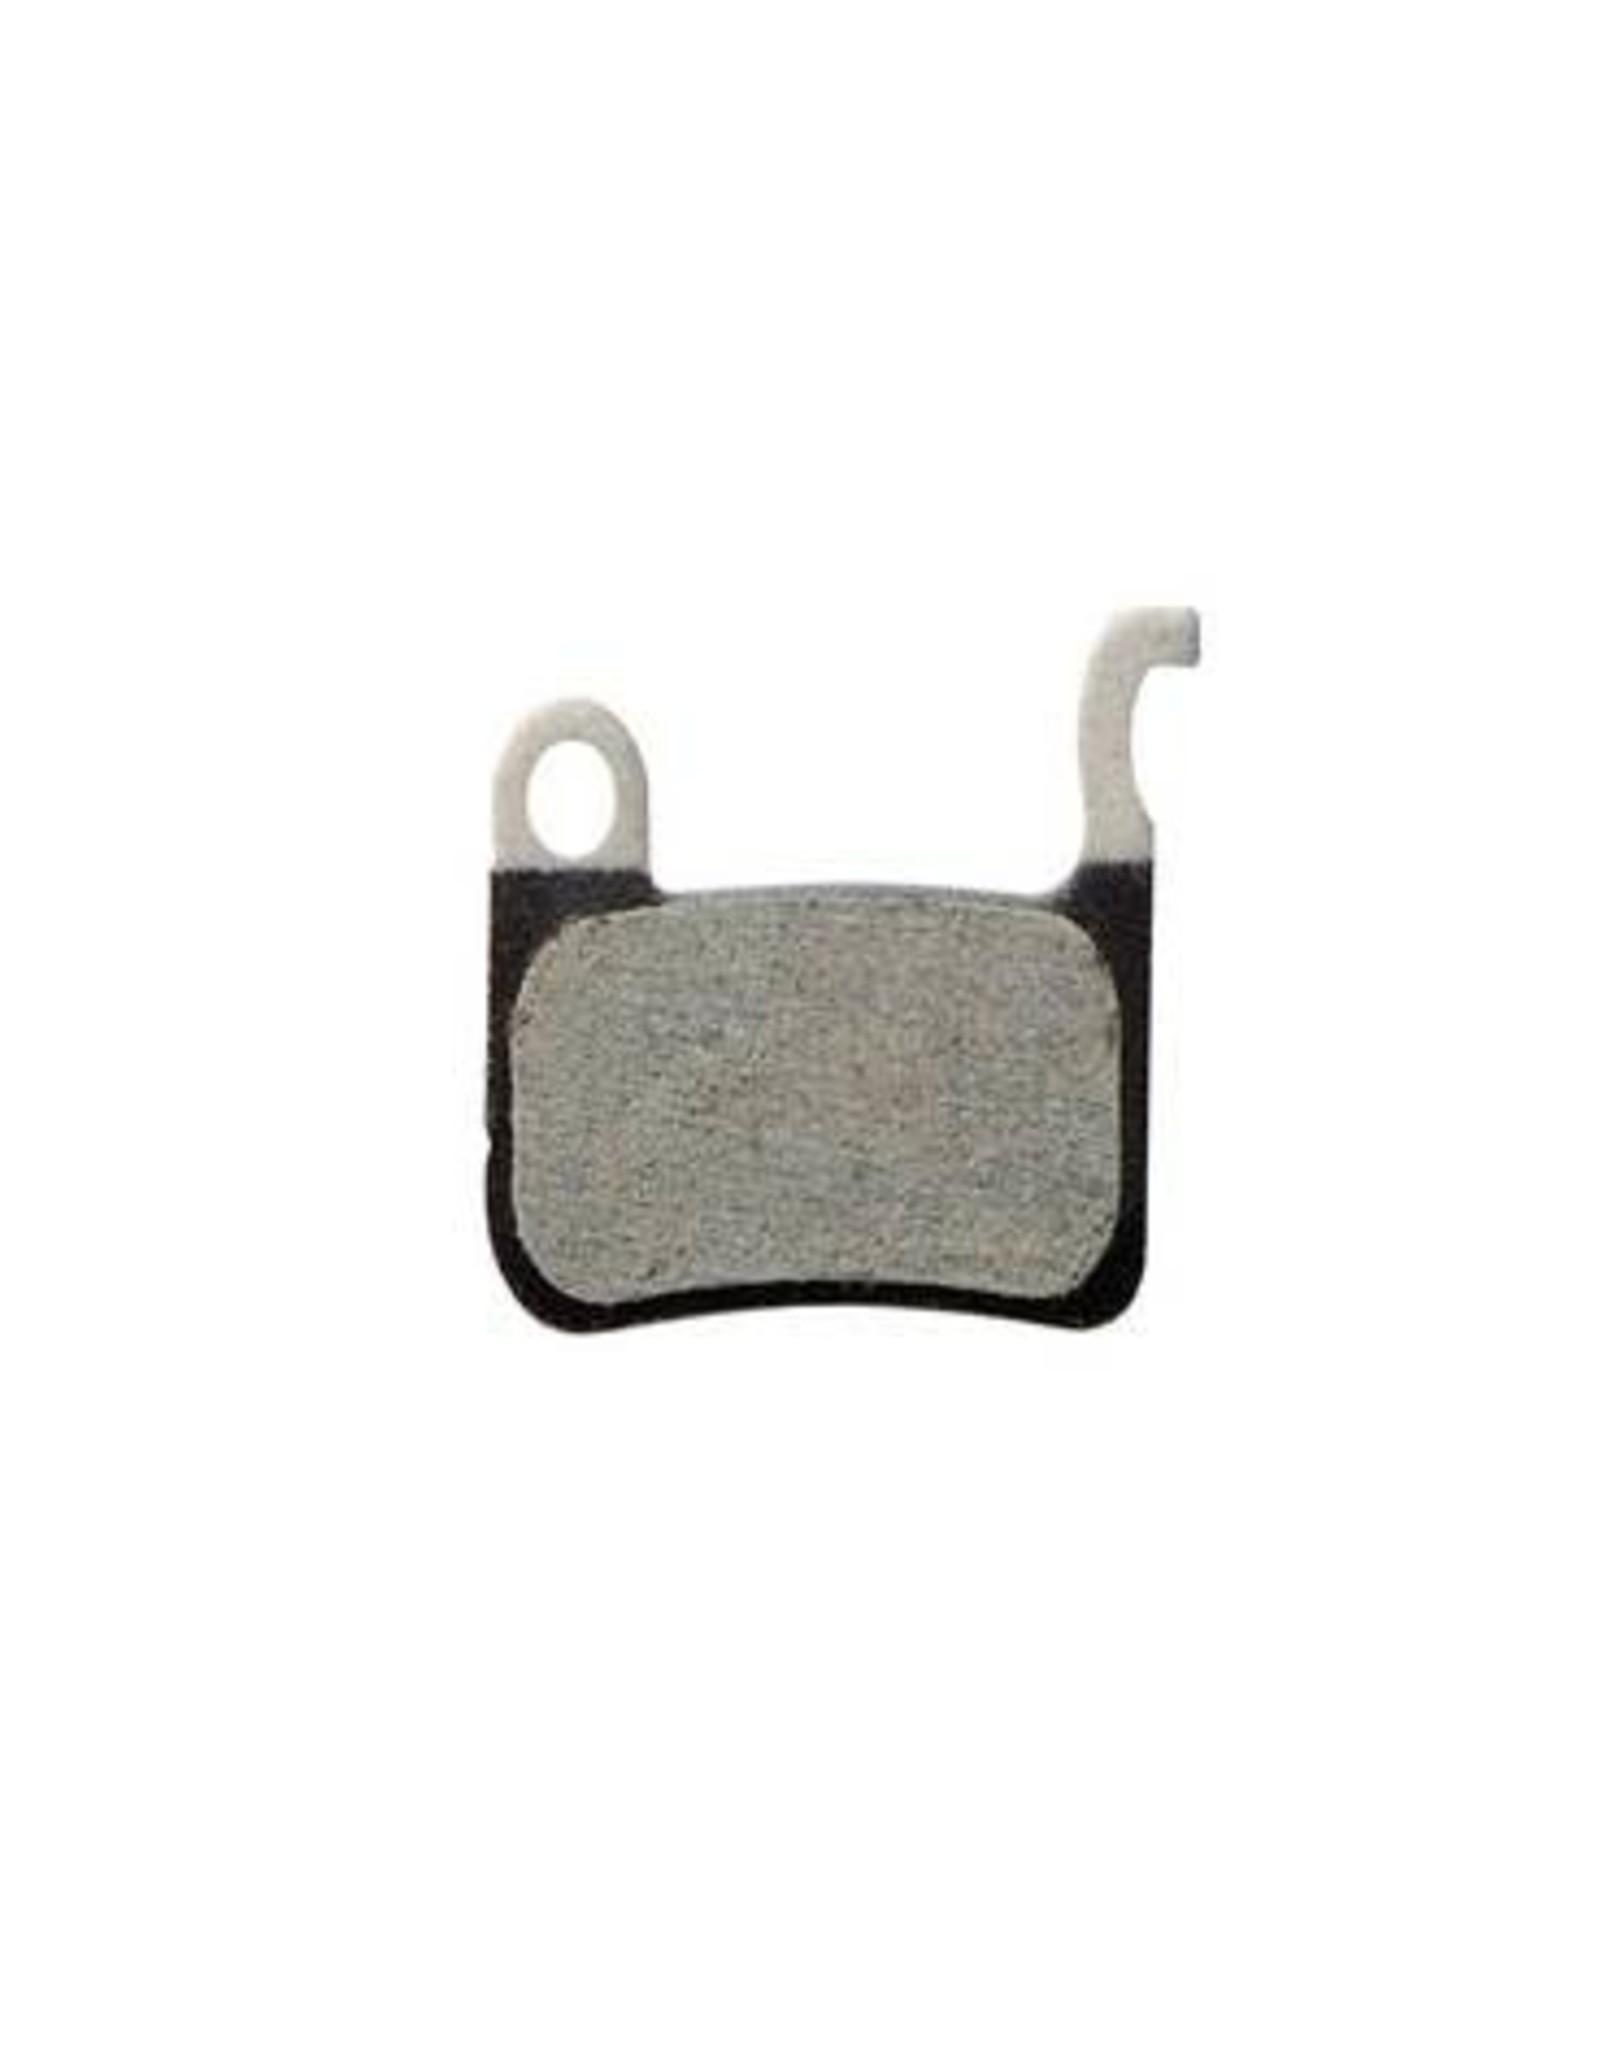 Shimano Plaquettes frein Shim A01S resin (Deore,XT,SLX,Alfine)